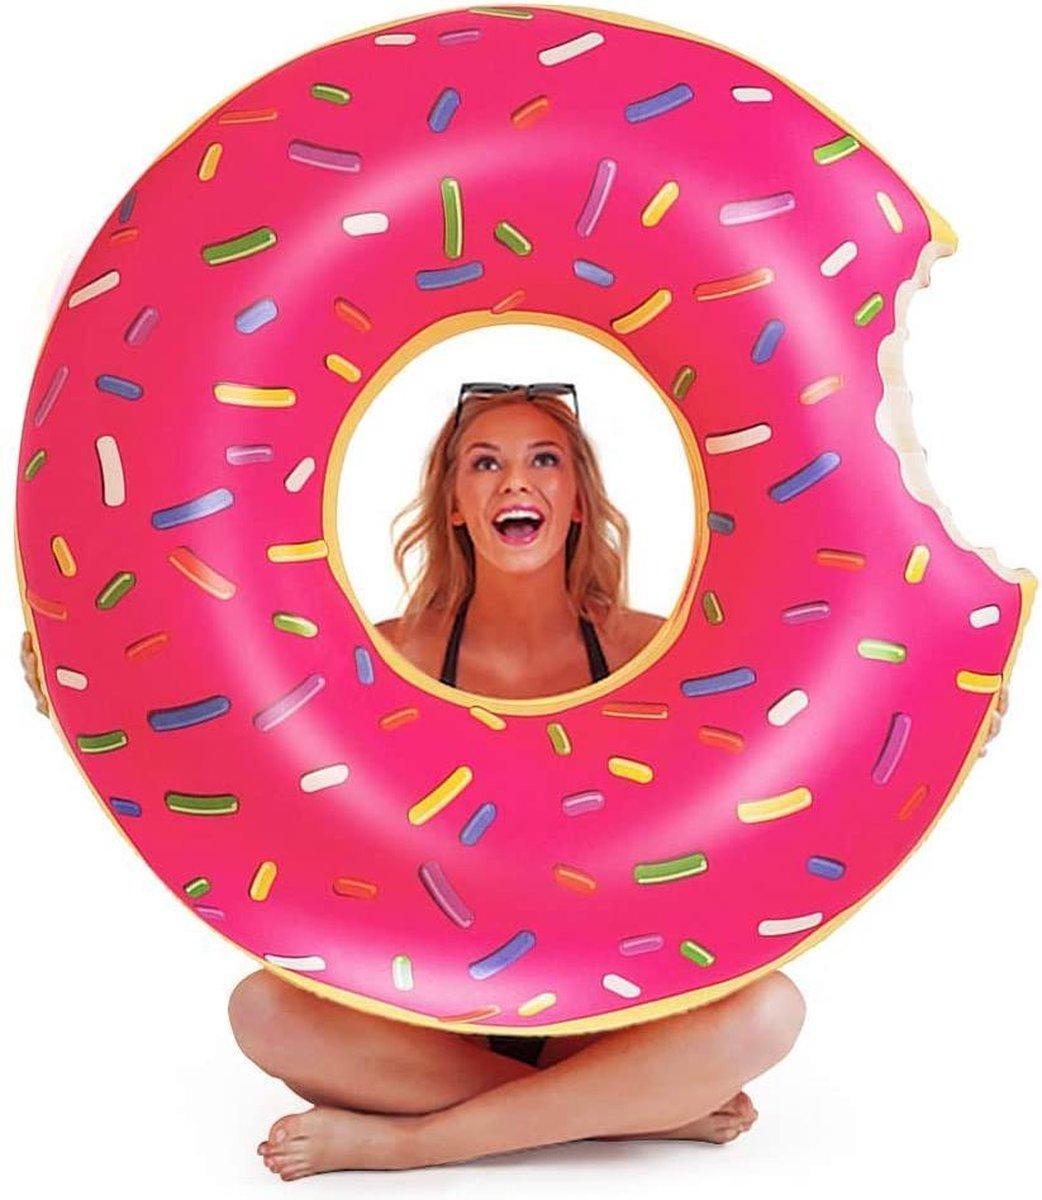 Zwemband | Zwembad | Donut | Luchtmatras | Luchtbed | 120 cm | PVC